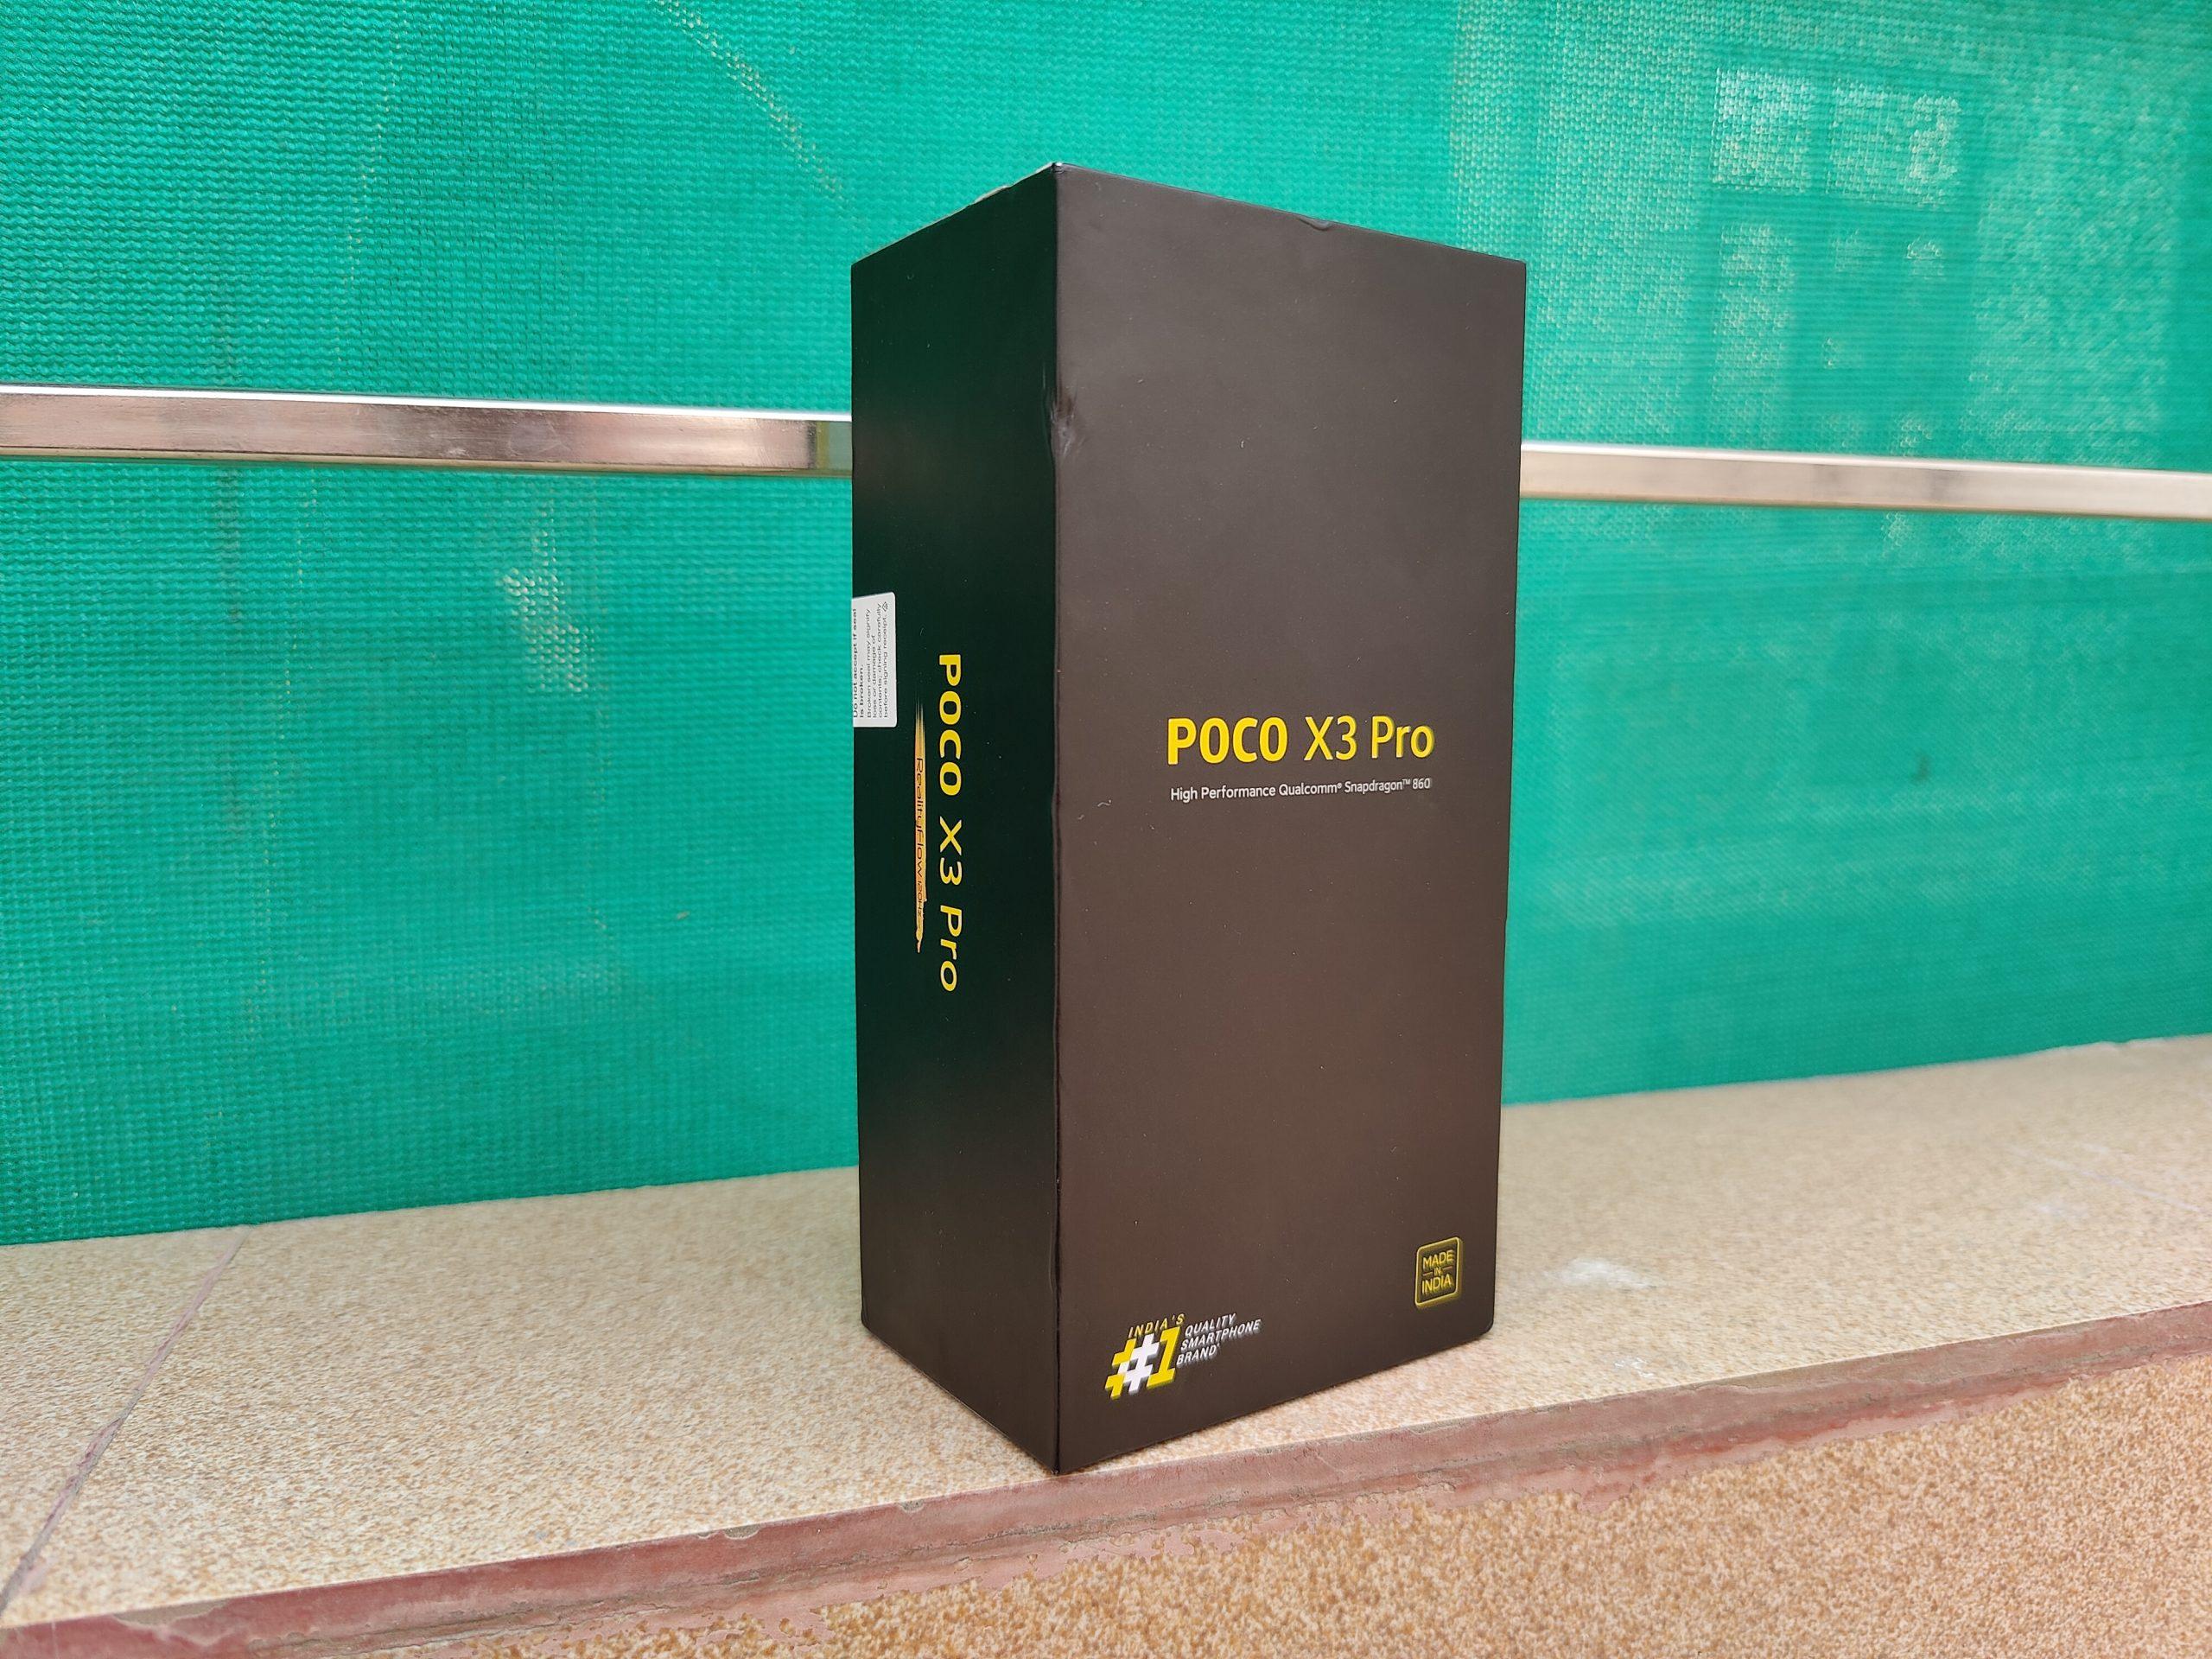 POCO X3 Pro Review